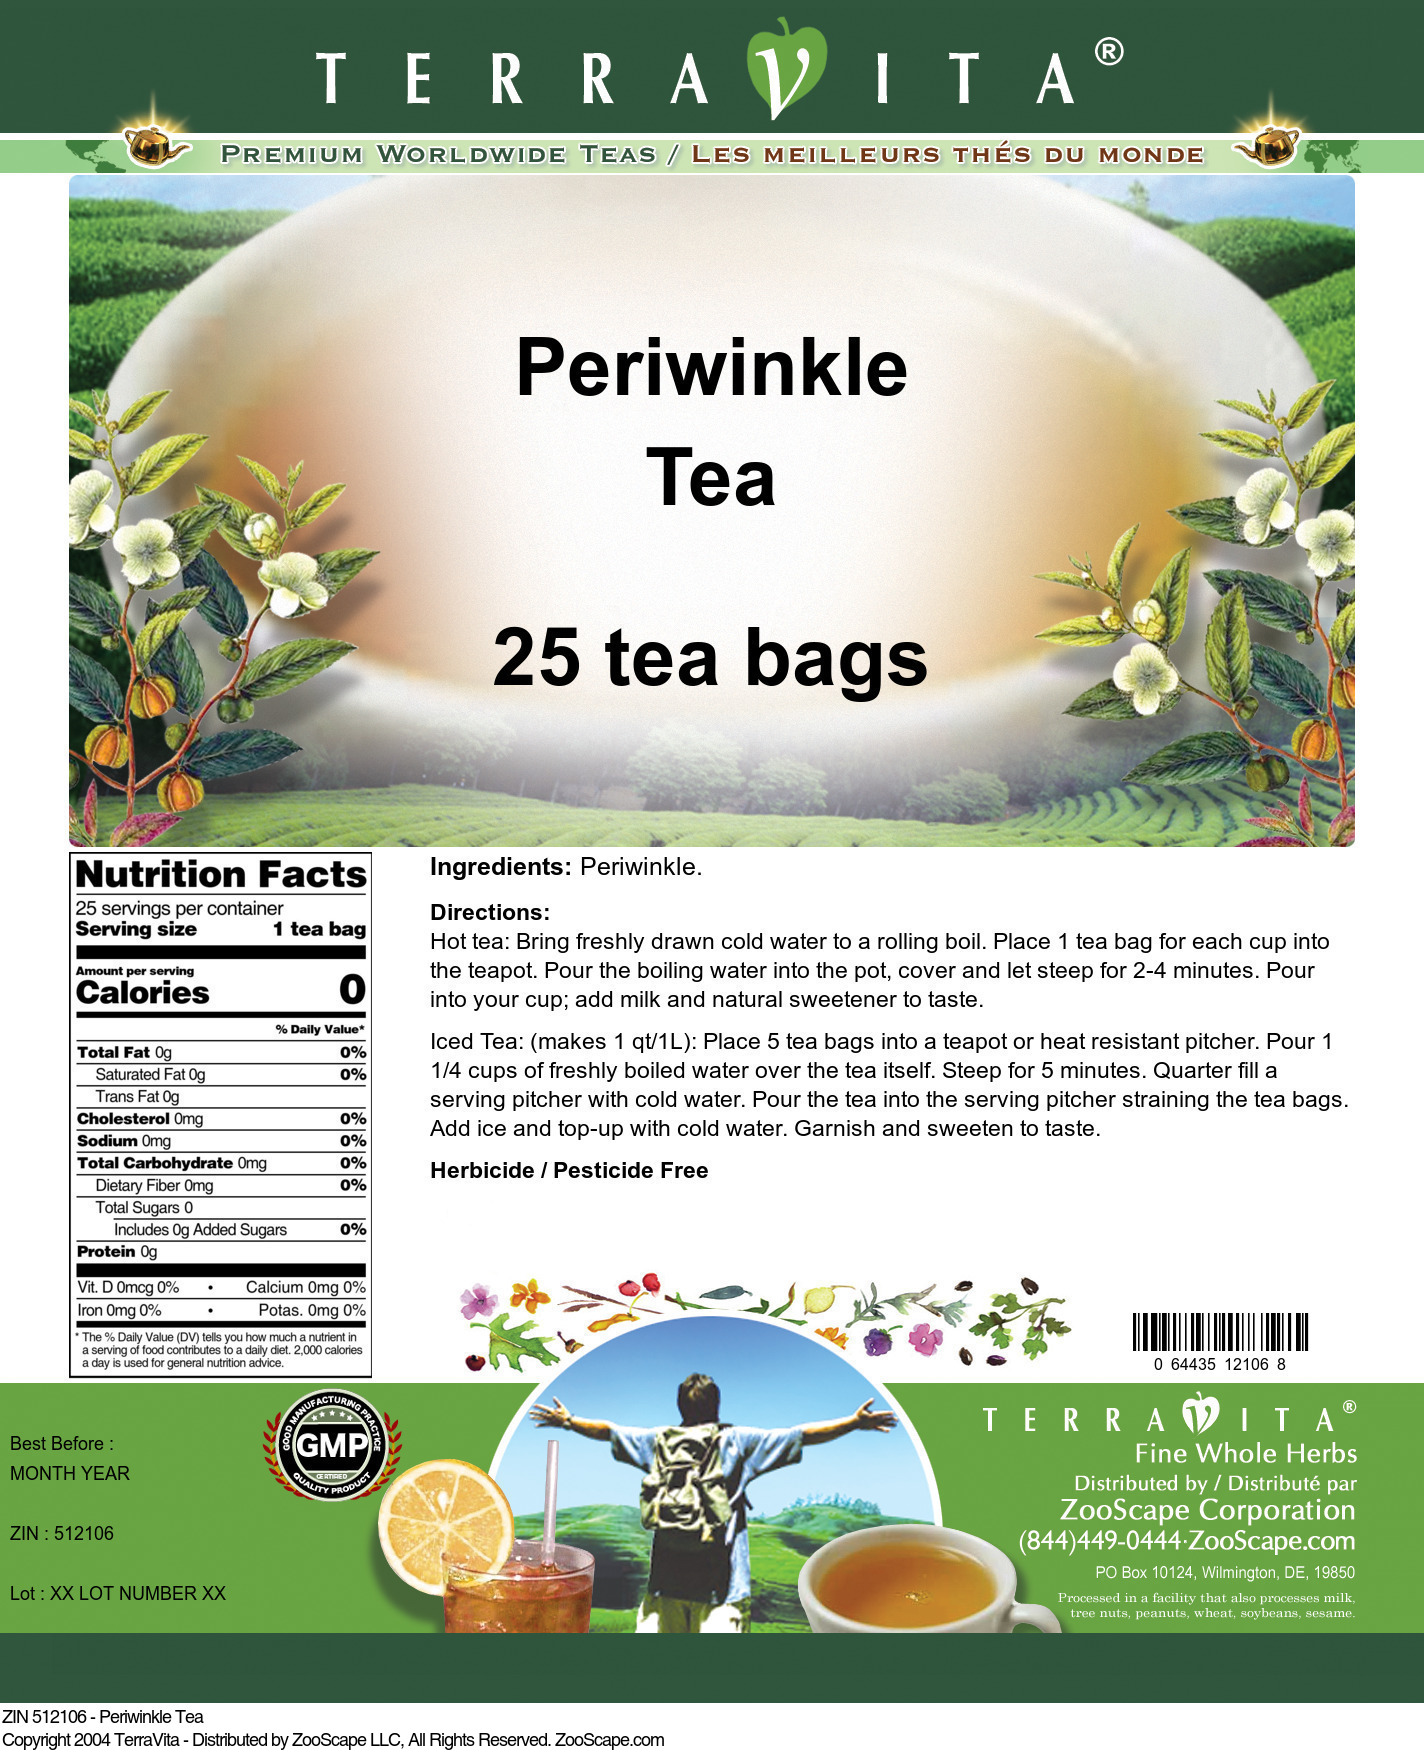 Periwinkle Tea